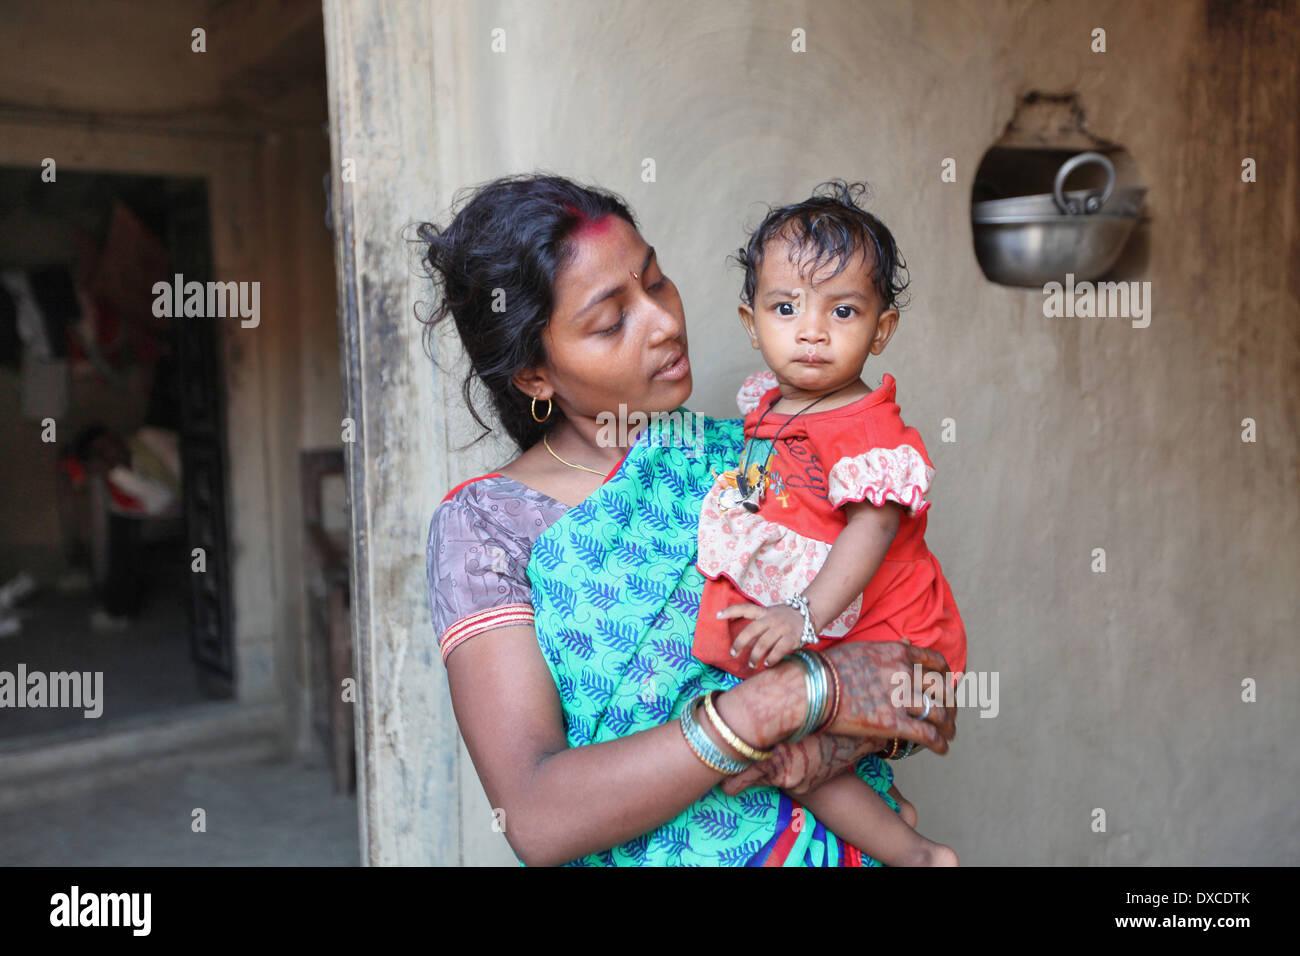 La mère et l'enfant. Kurmi caste. Village, district Hazaribaug Bhilwara, Jharkhand, India Photo Stock